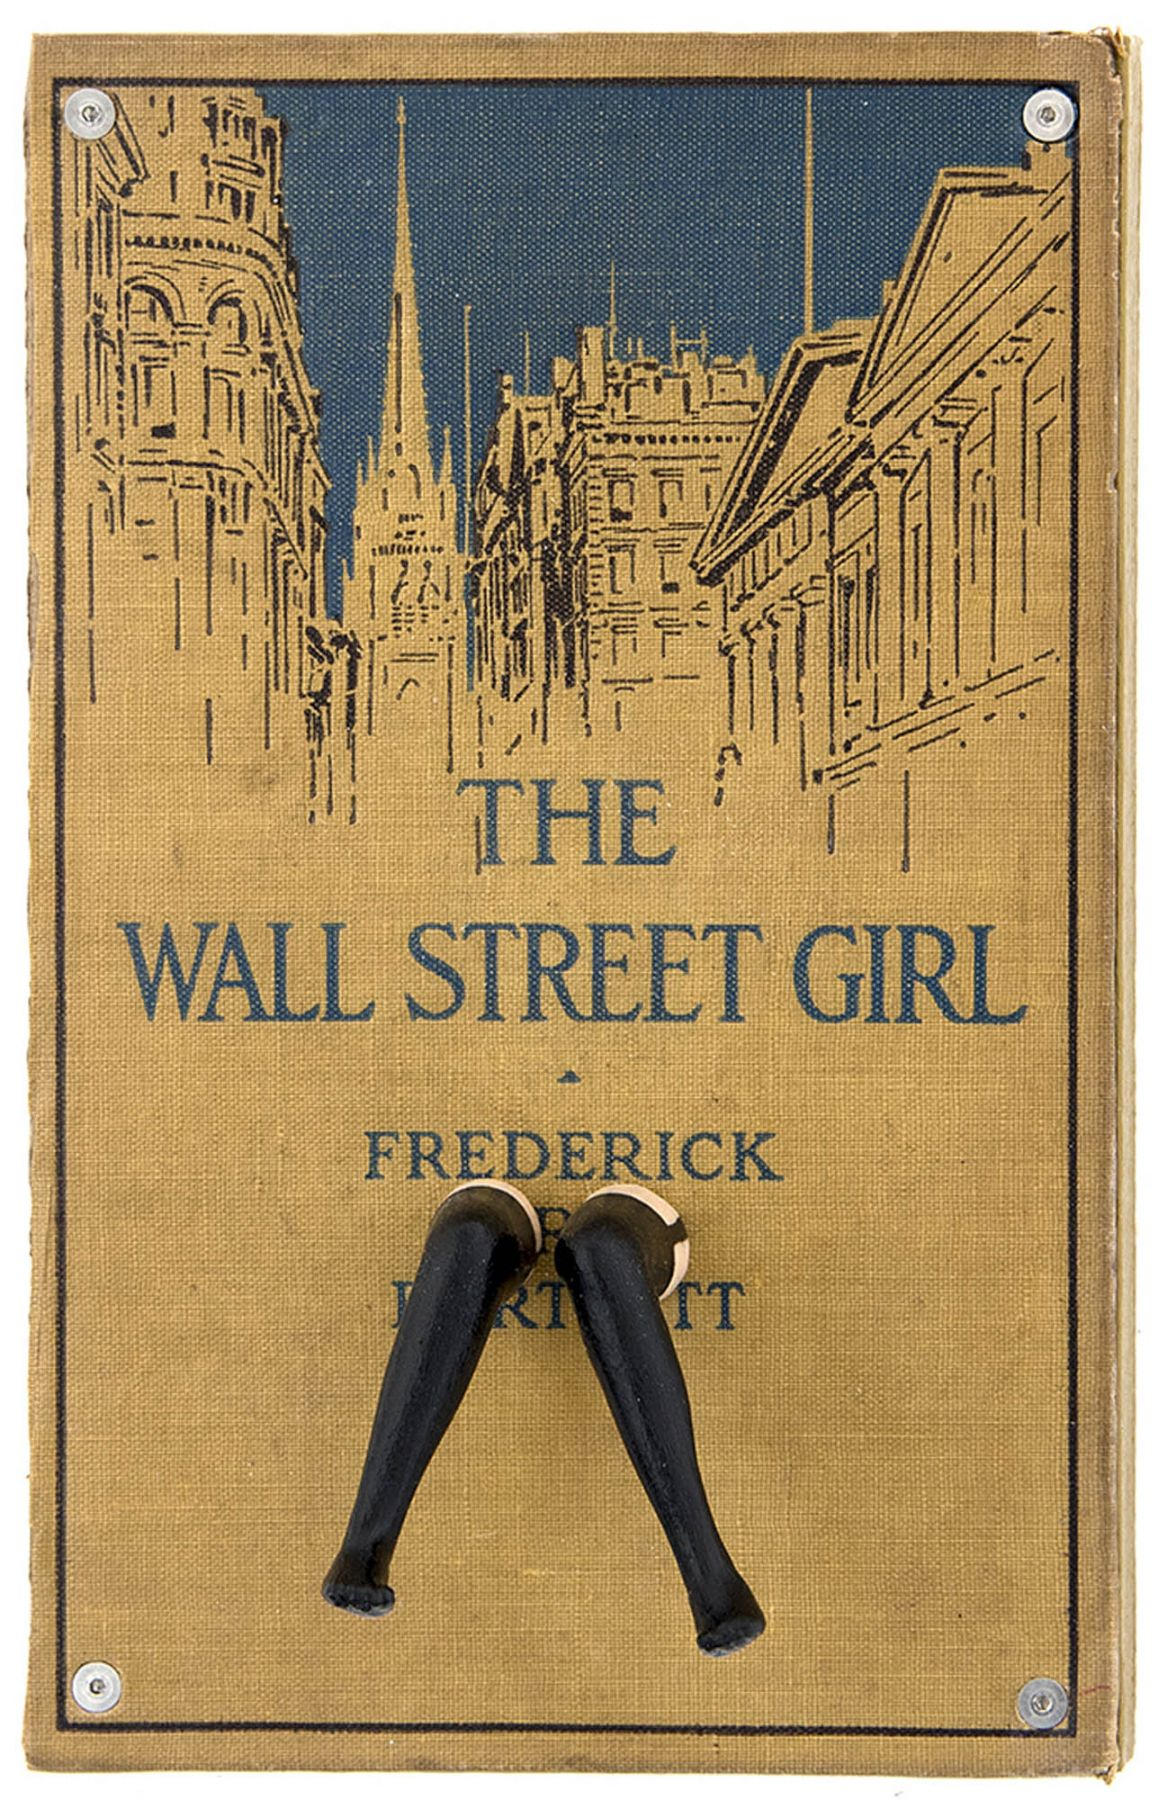 Nancy Gifford, The Wall Street Girl - #metoo Series, 2017